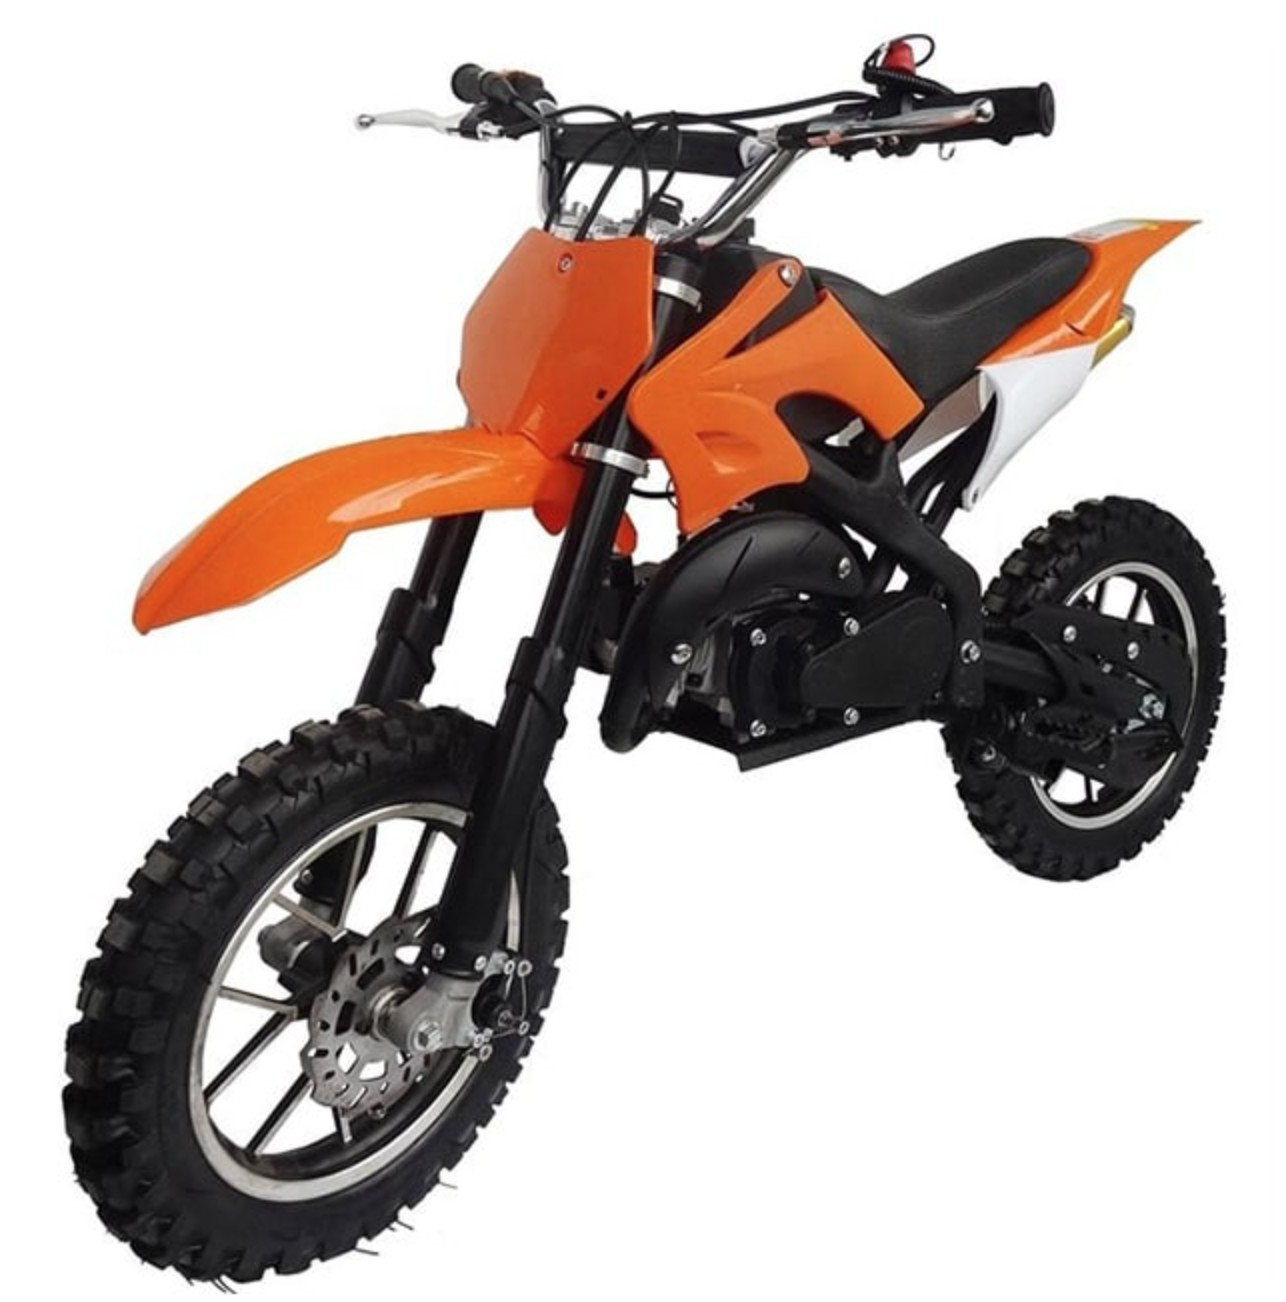 moto cross kxd 708 orange. Black Bedroom Furniture Sets. Home Design Ideas